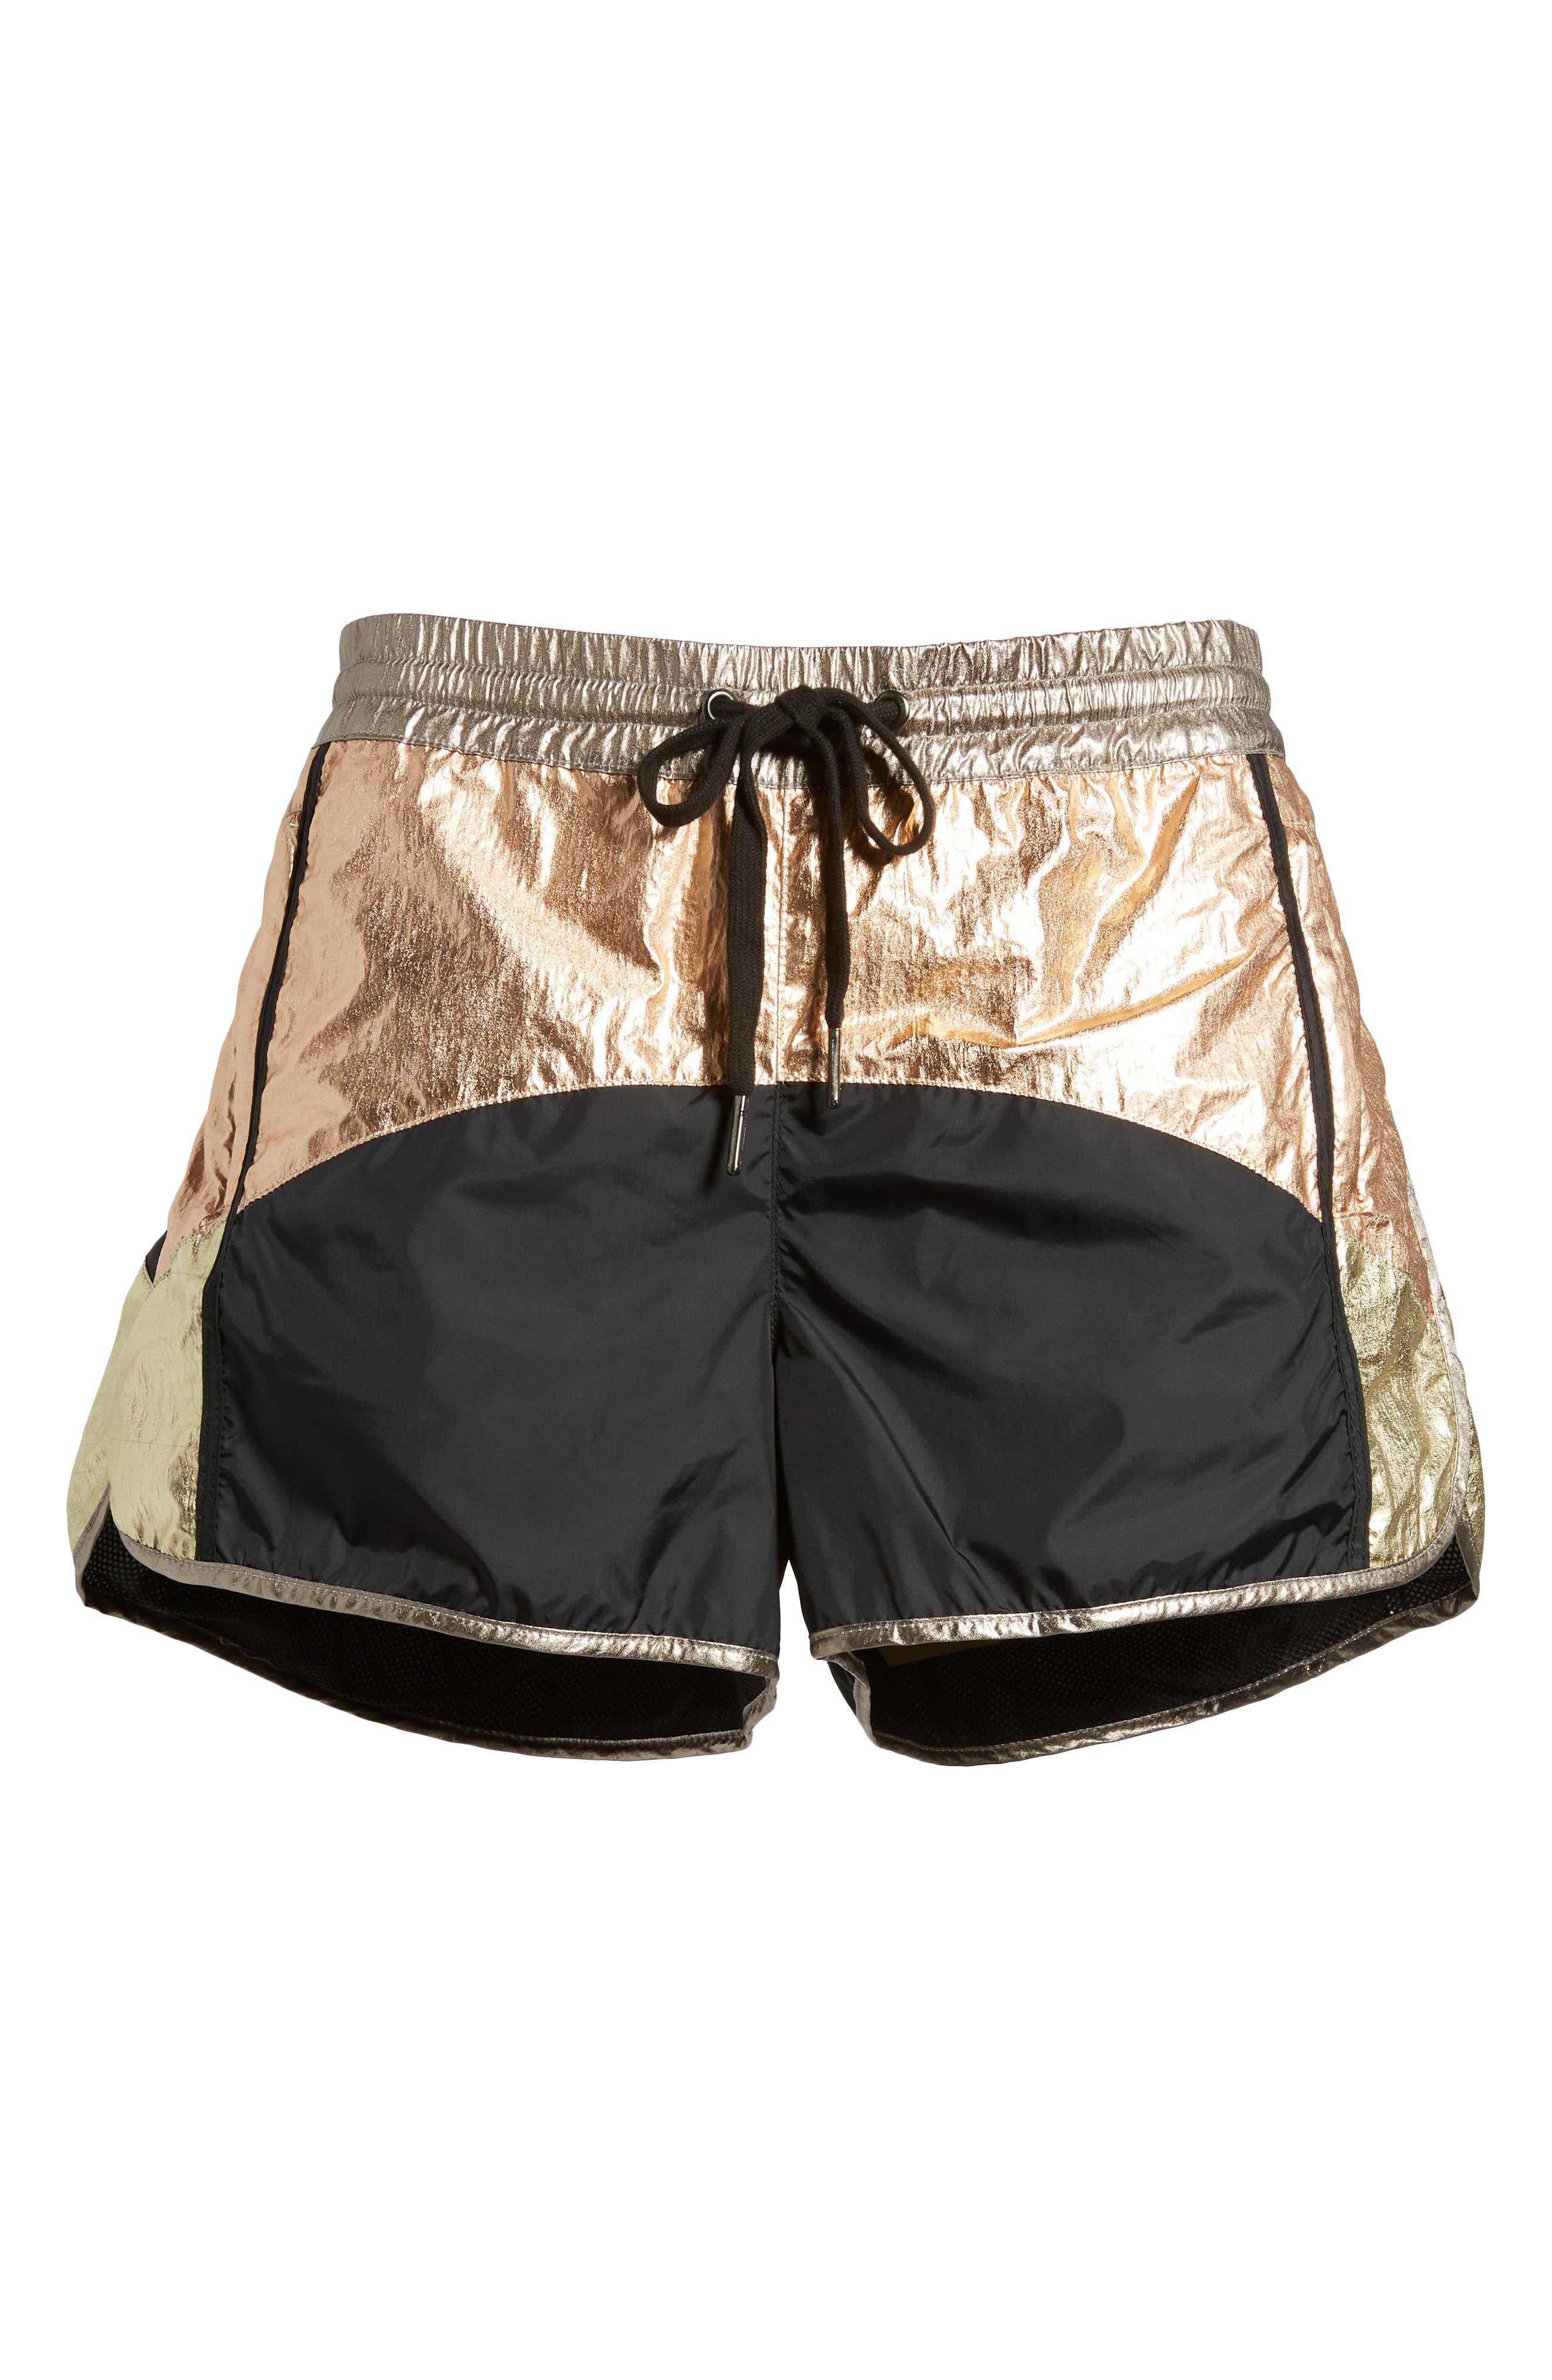 Colorblock Shorts,                             Alternate thumbnail 6, color,                             BLACK